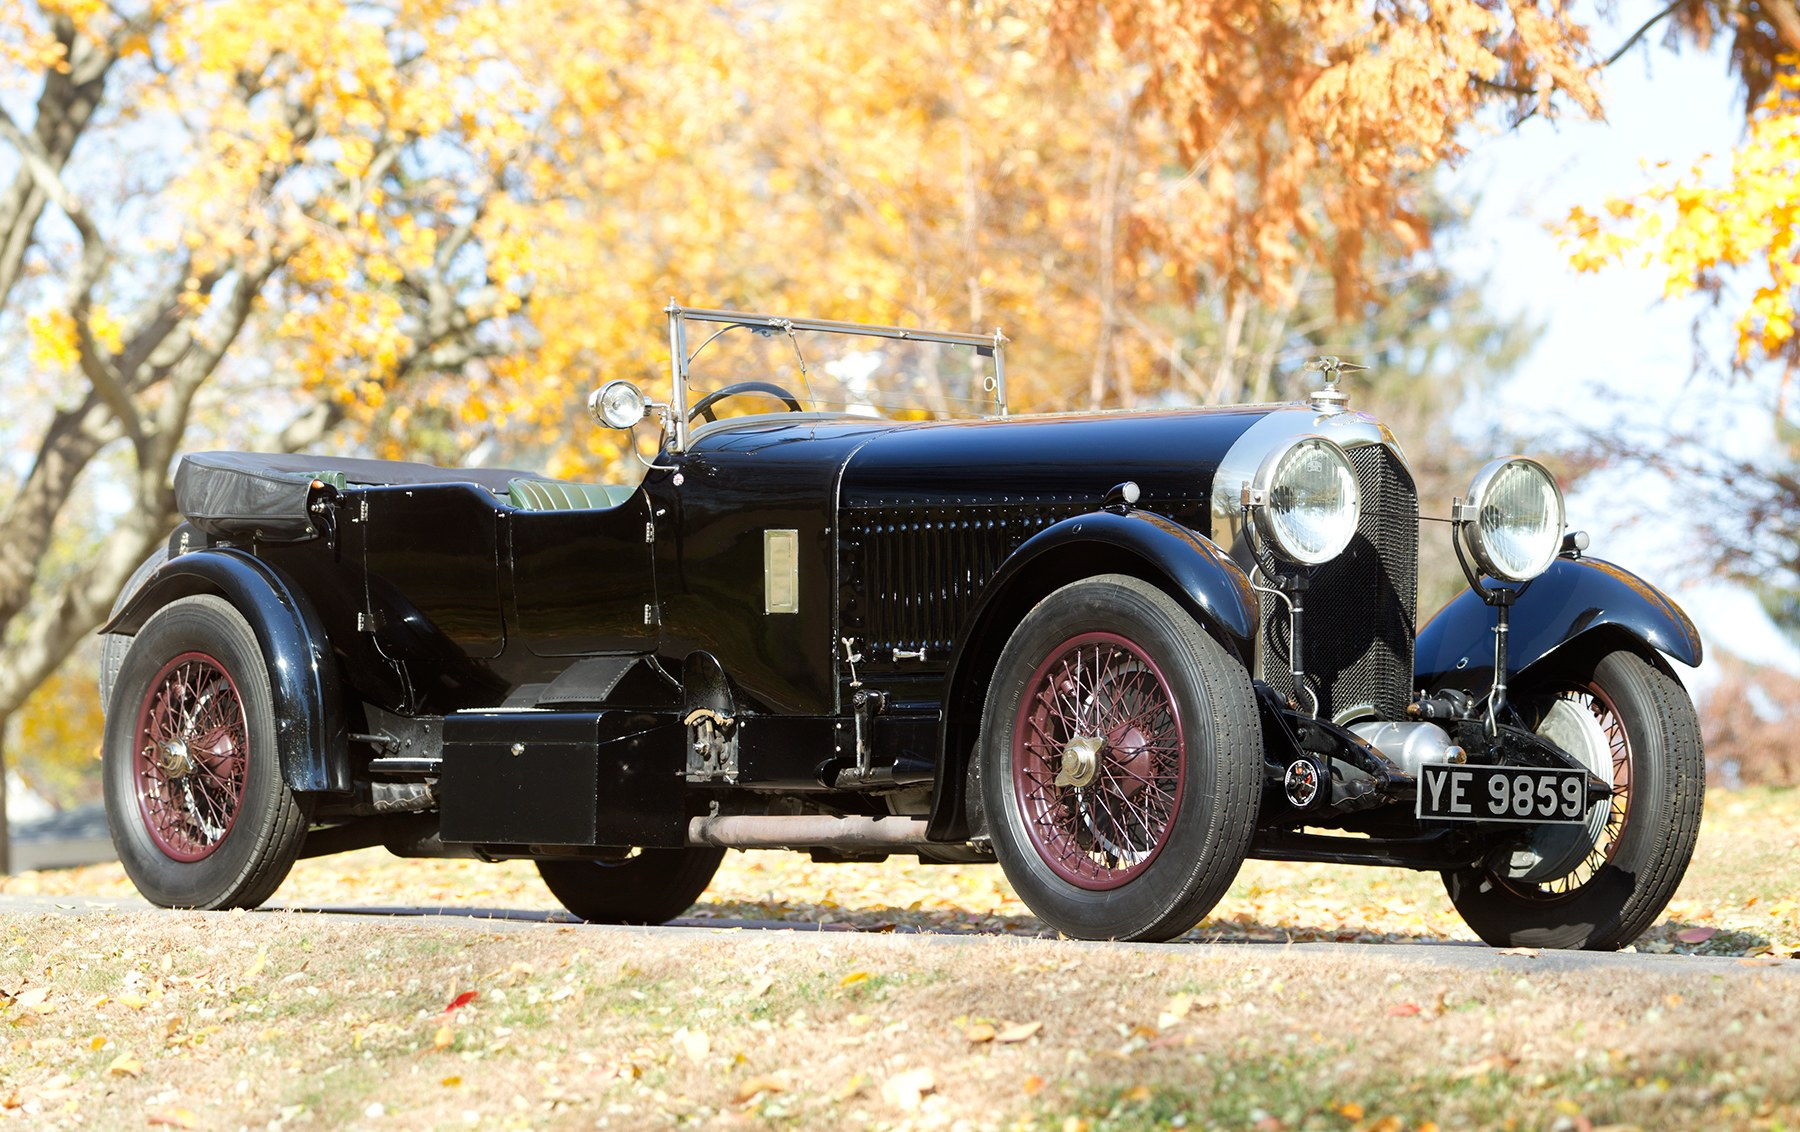 1927 Bentley 6 1/2 Litre Sports Tourer